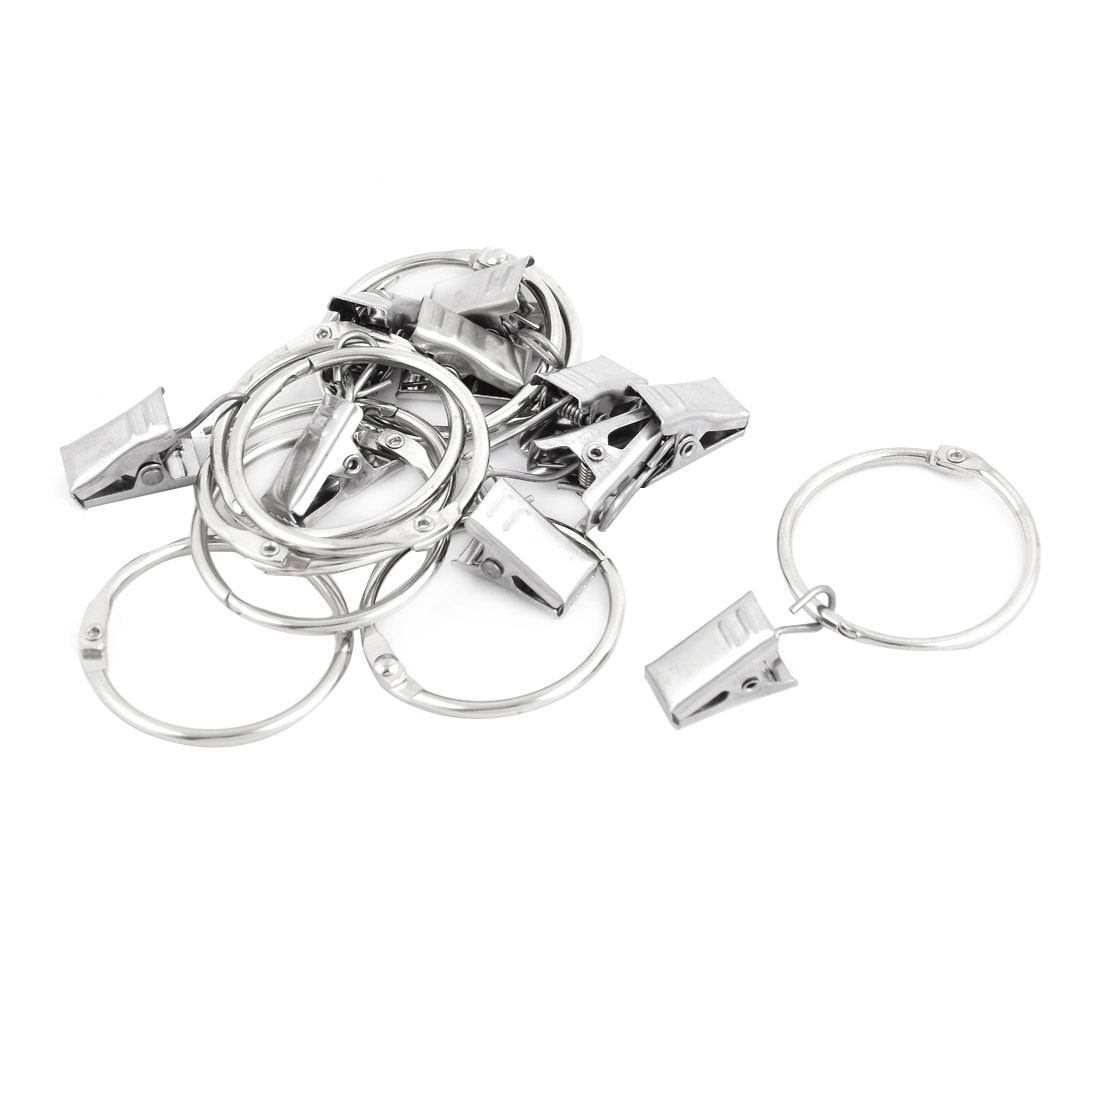 Metal Window Curtain Drapery Rod Hanging Hook Hanger Clip Ring Silver Tone 10pcs